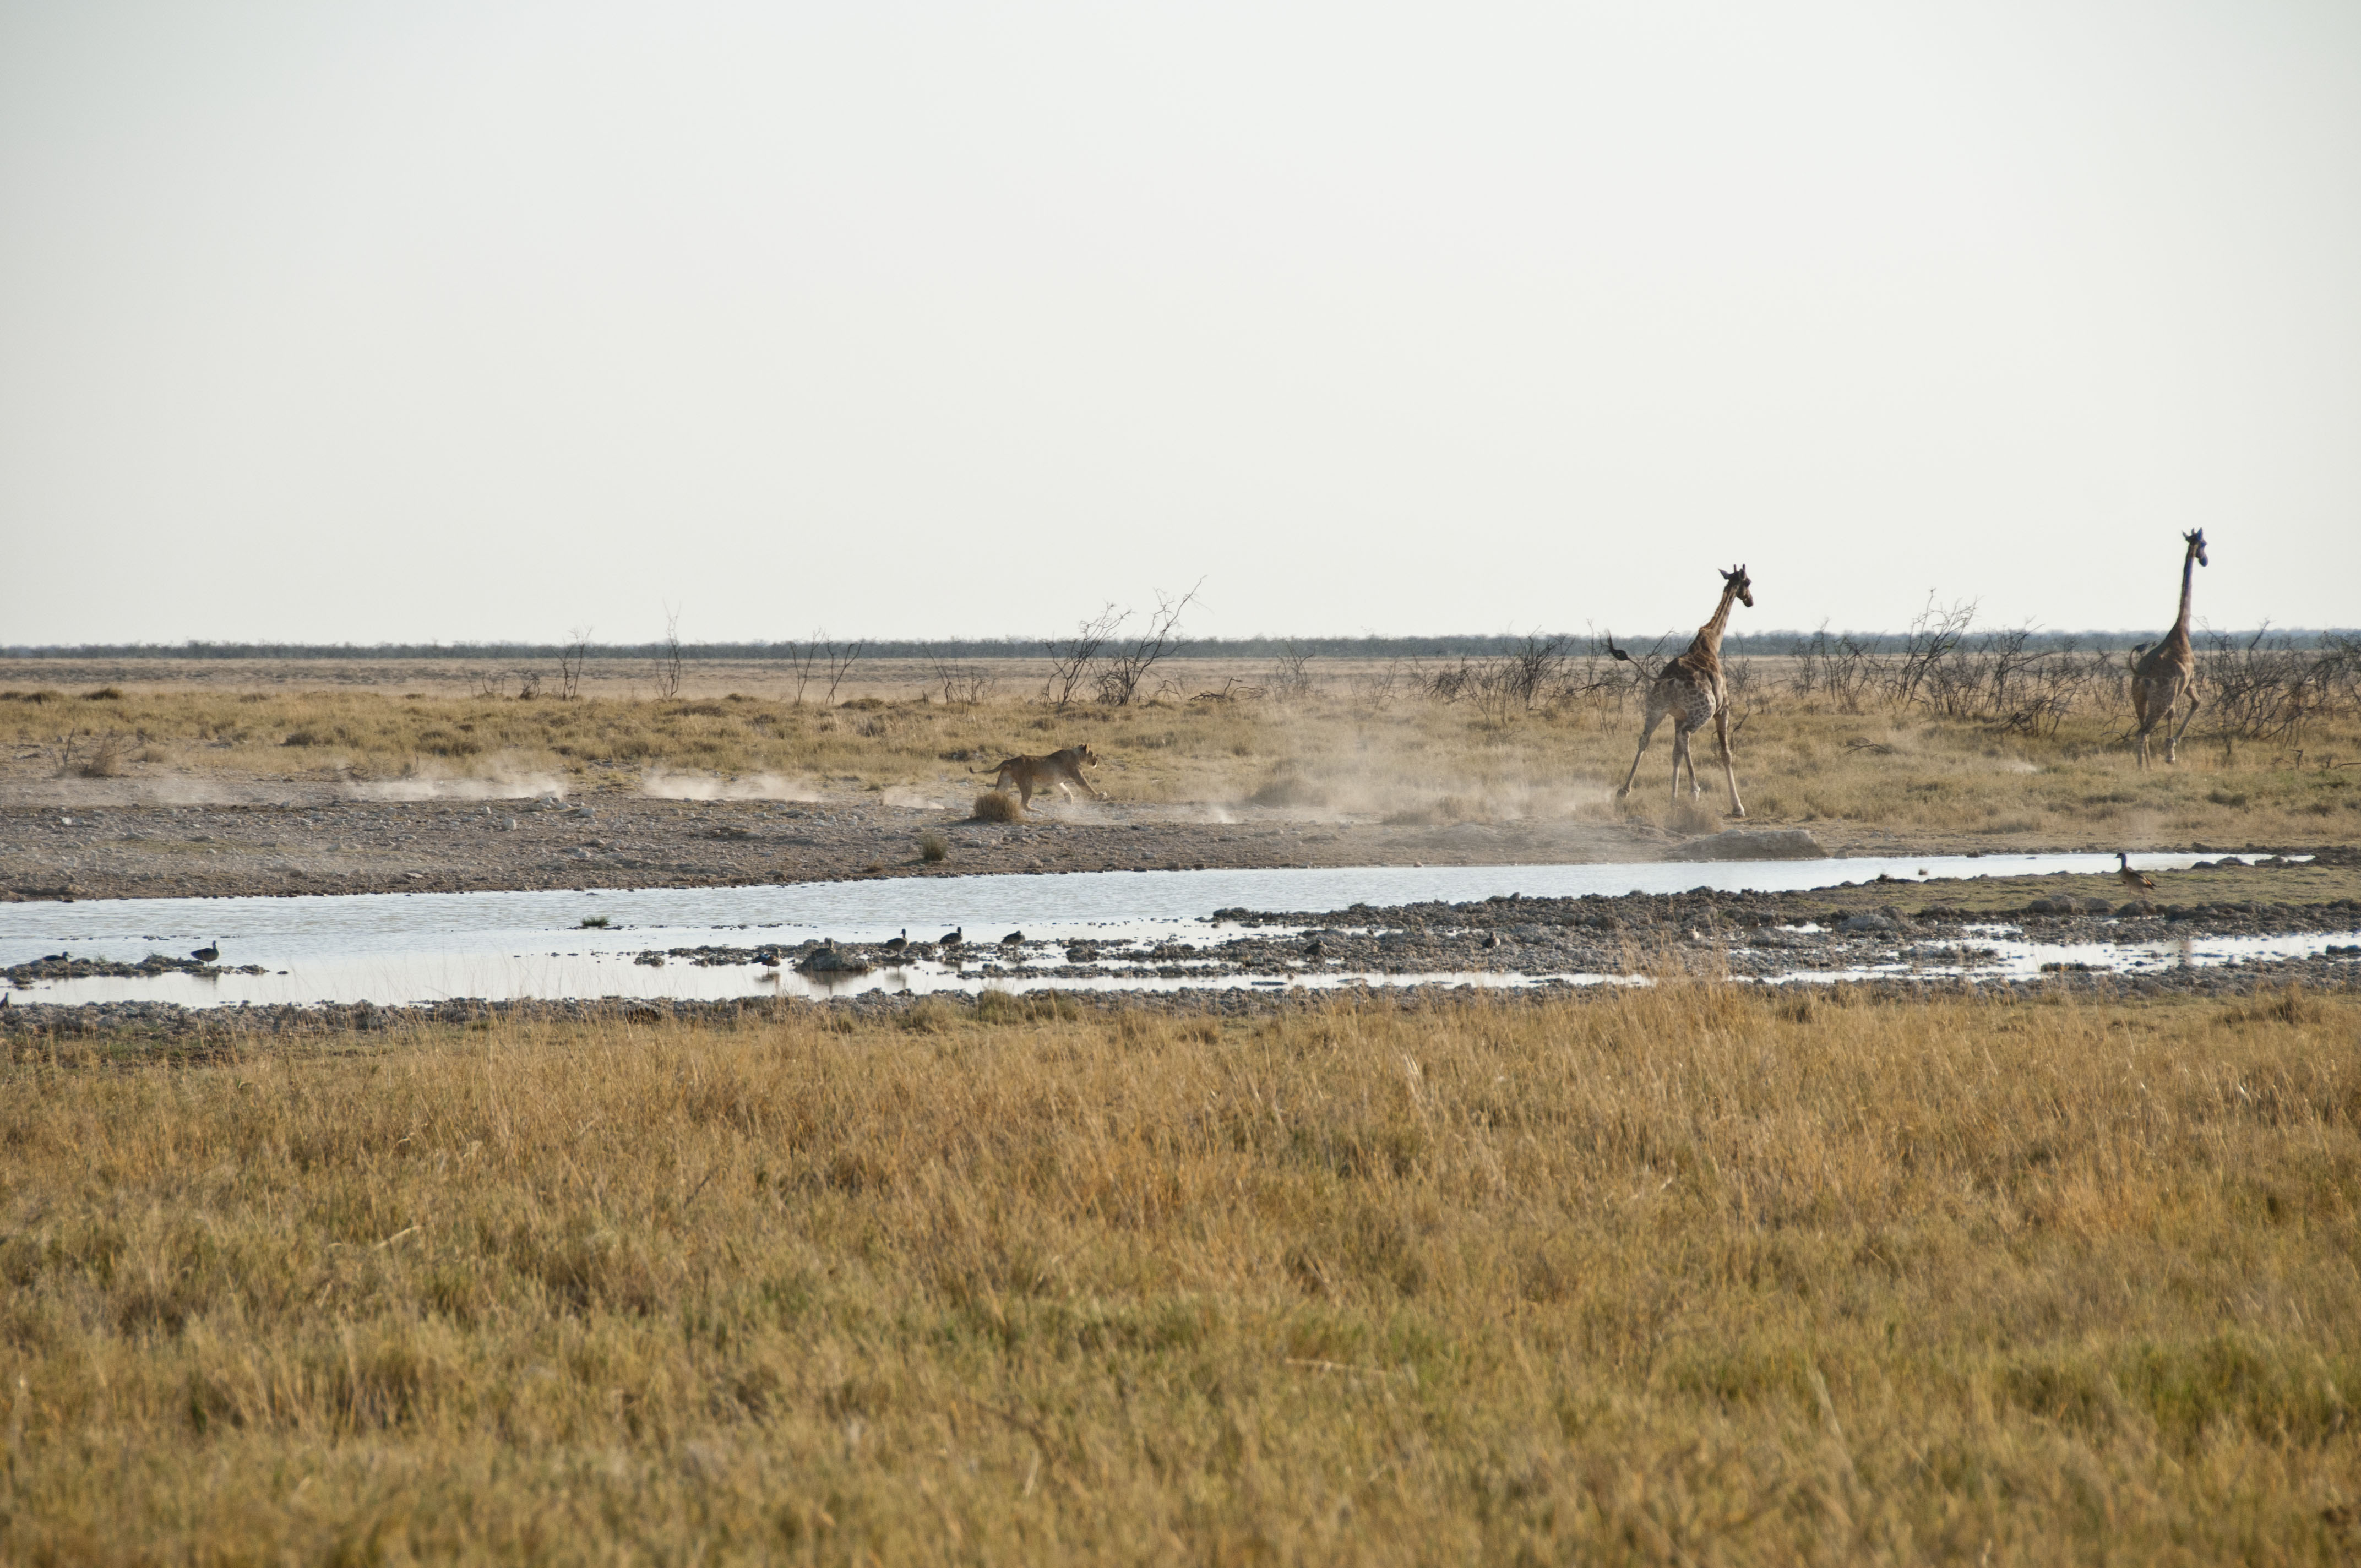 namibia_2014_kaokoveld-etoscha_120